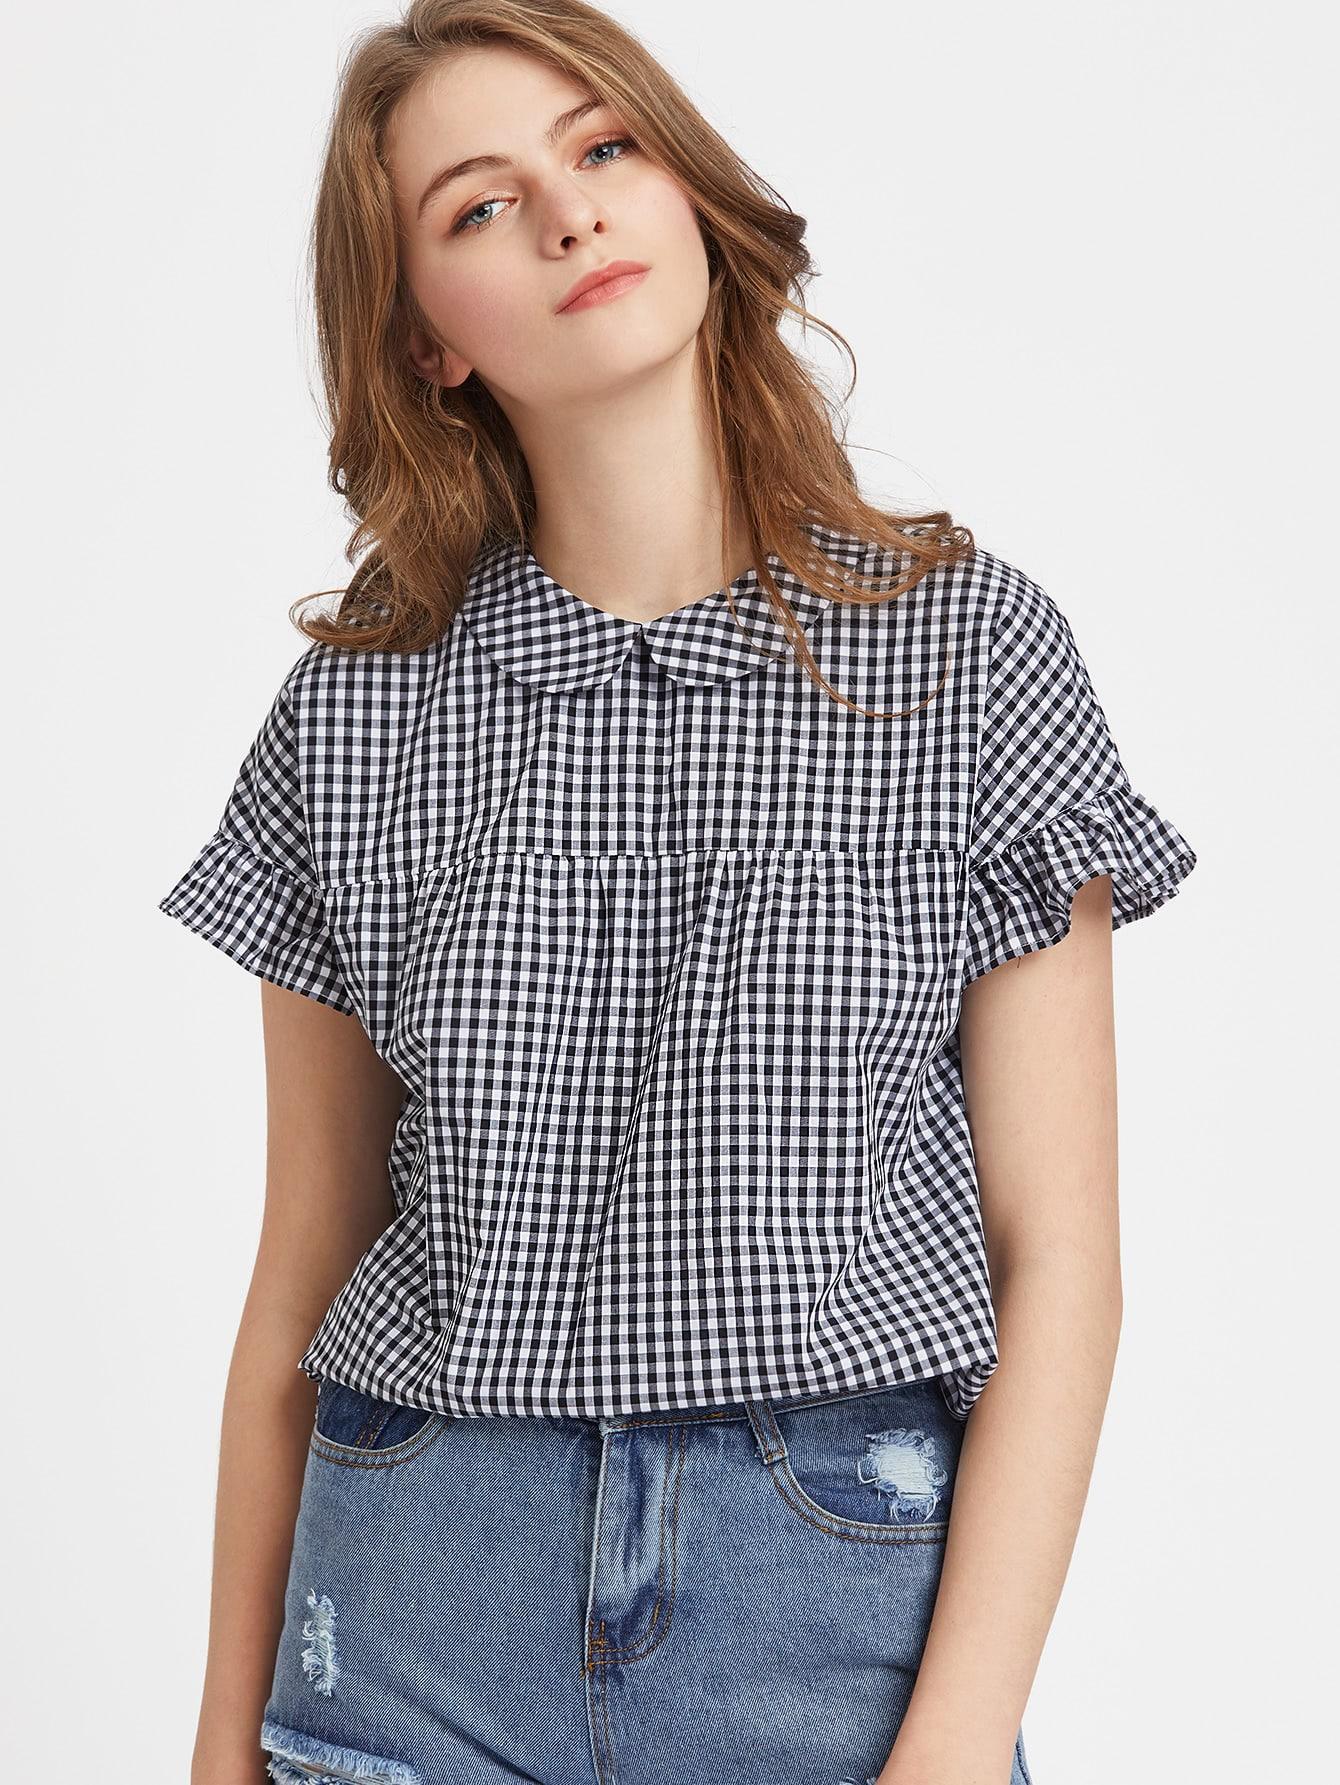 blouse170406701_2